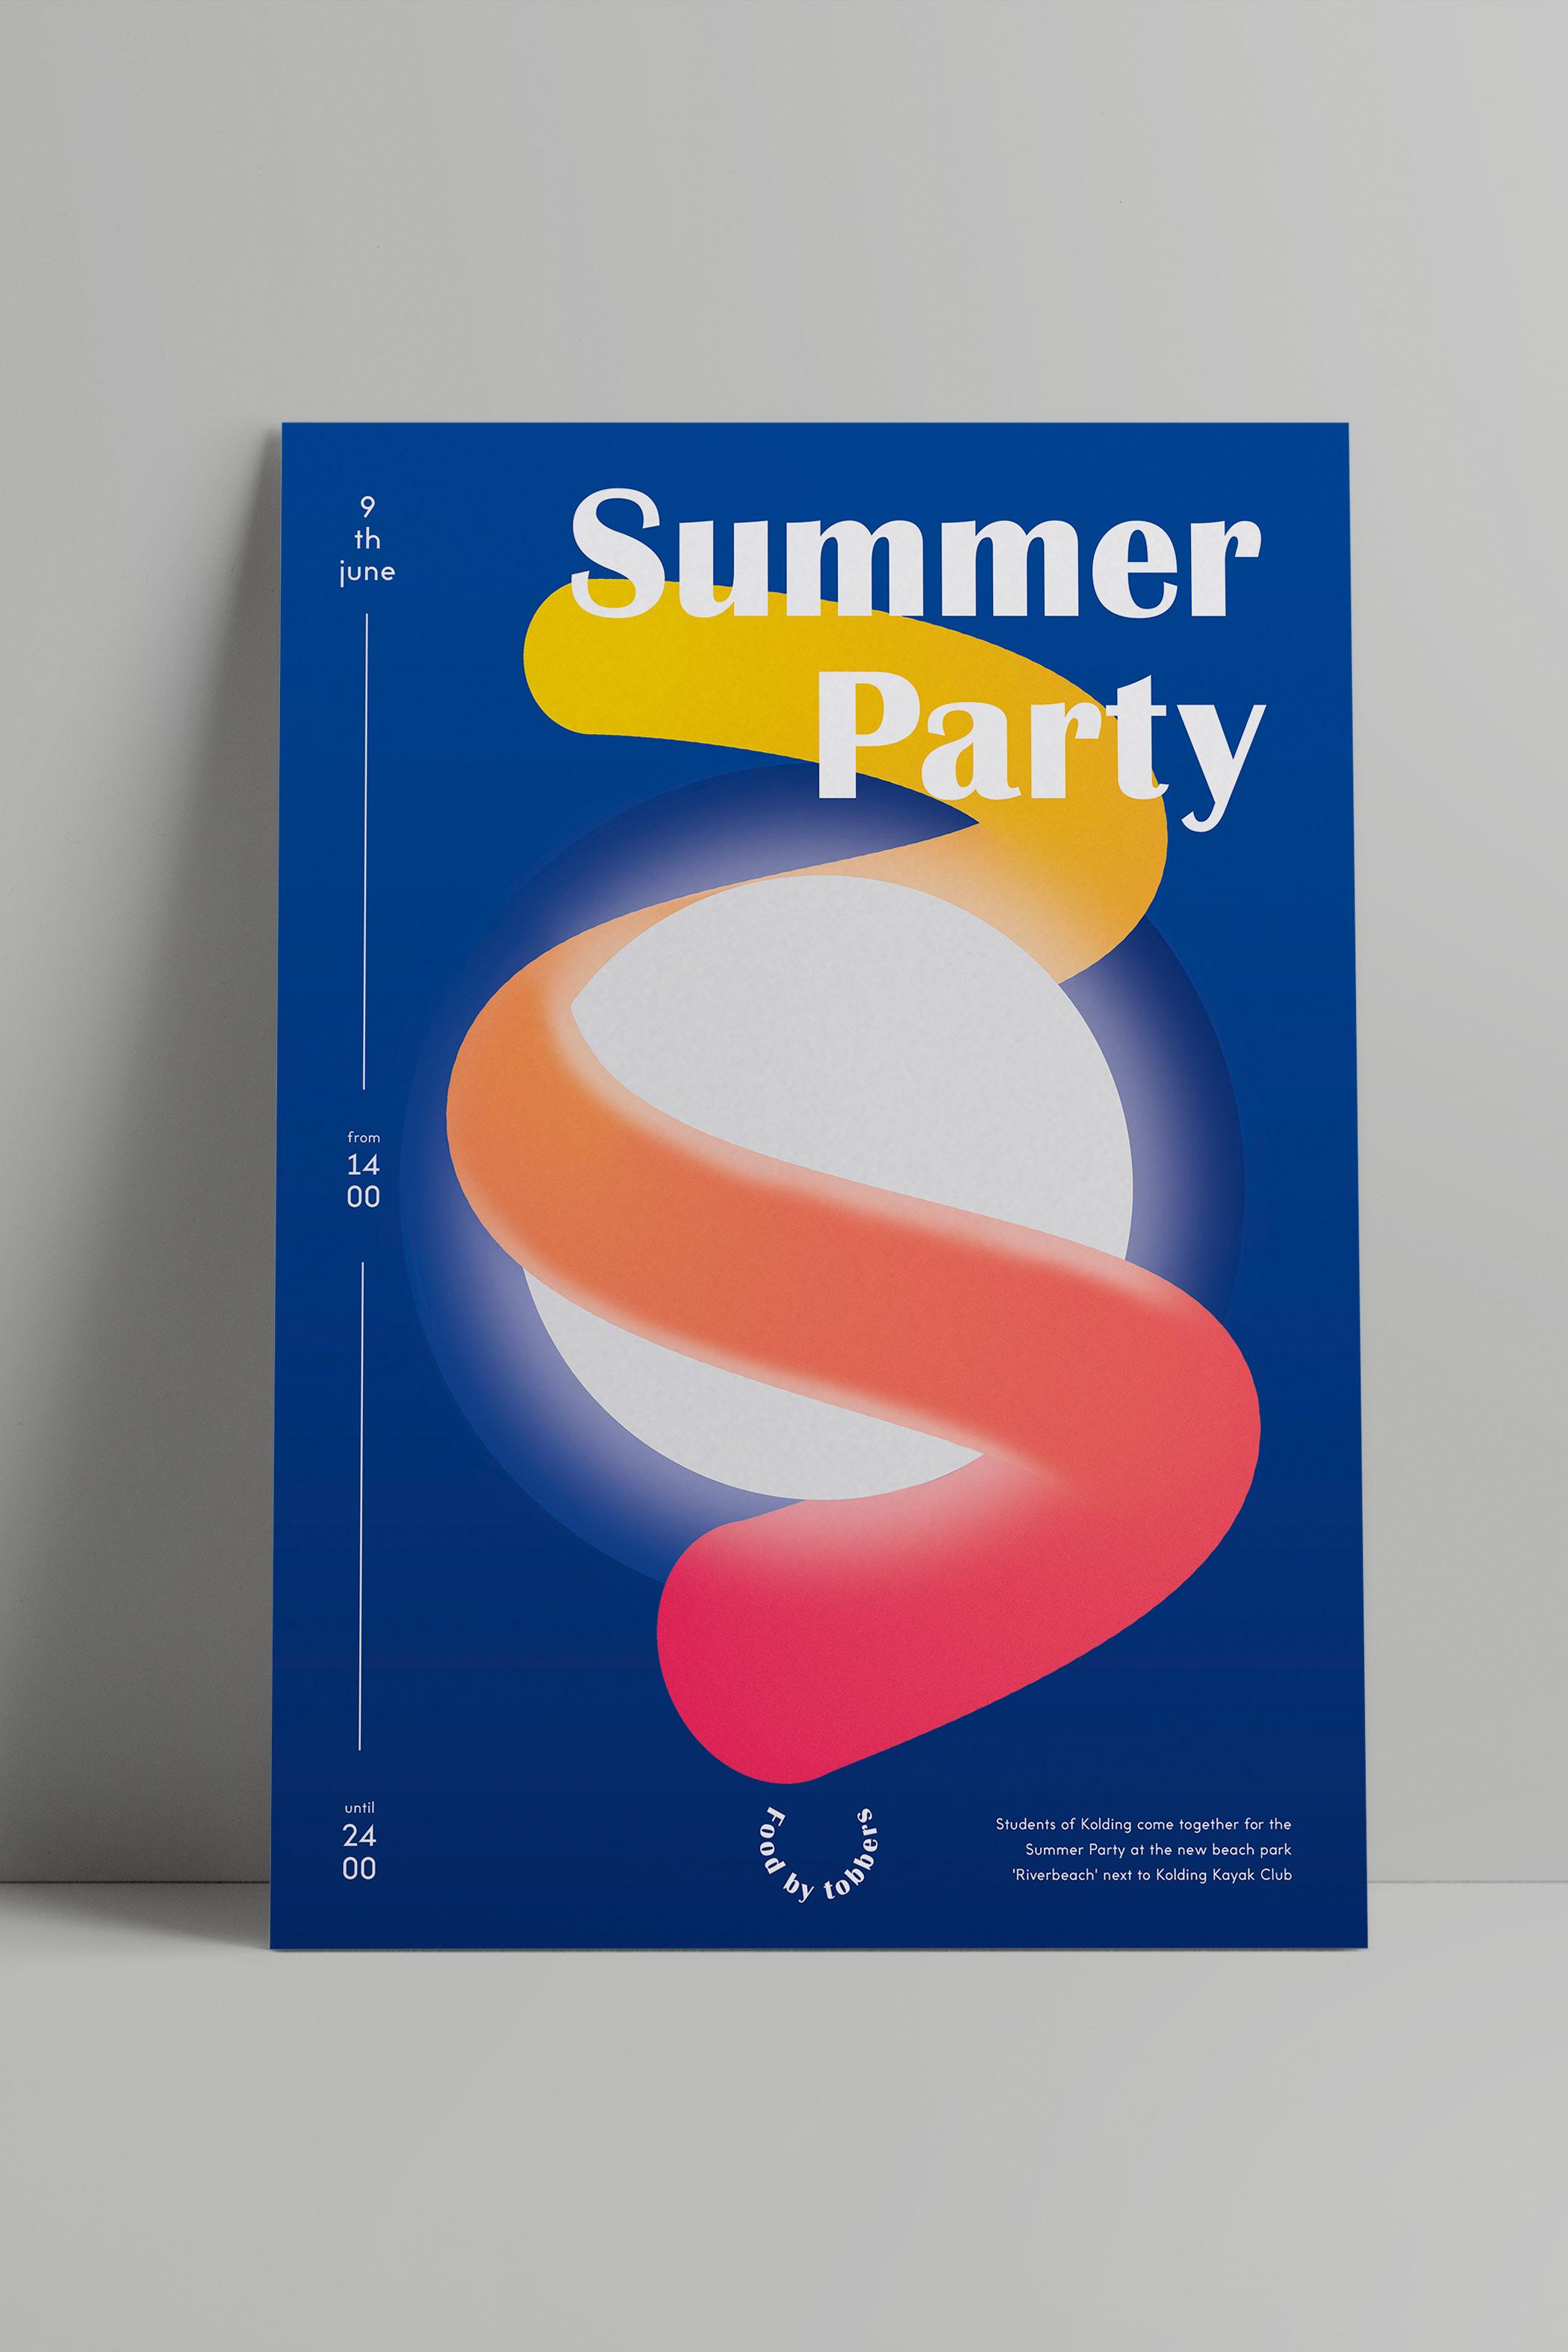 Mockup_Summerparty